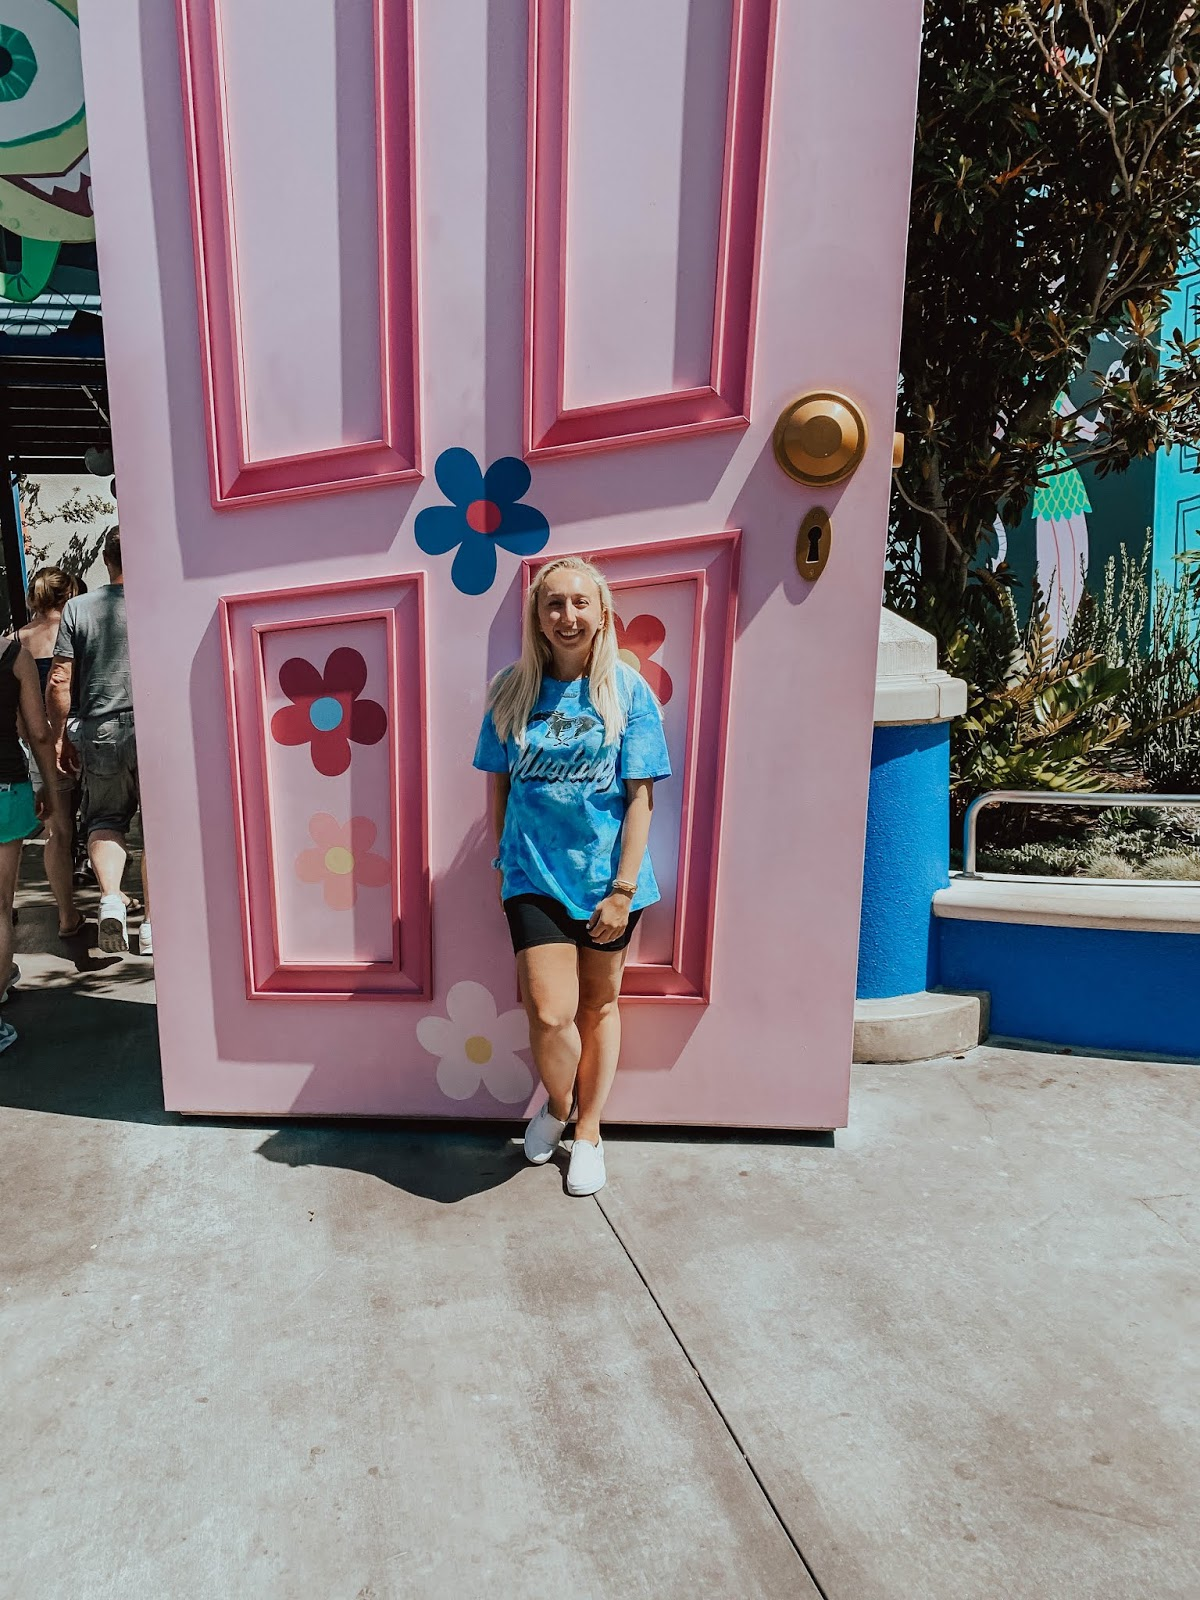 Fifteen Days In California: Part 3